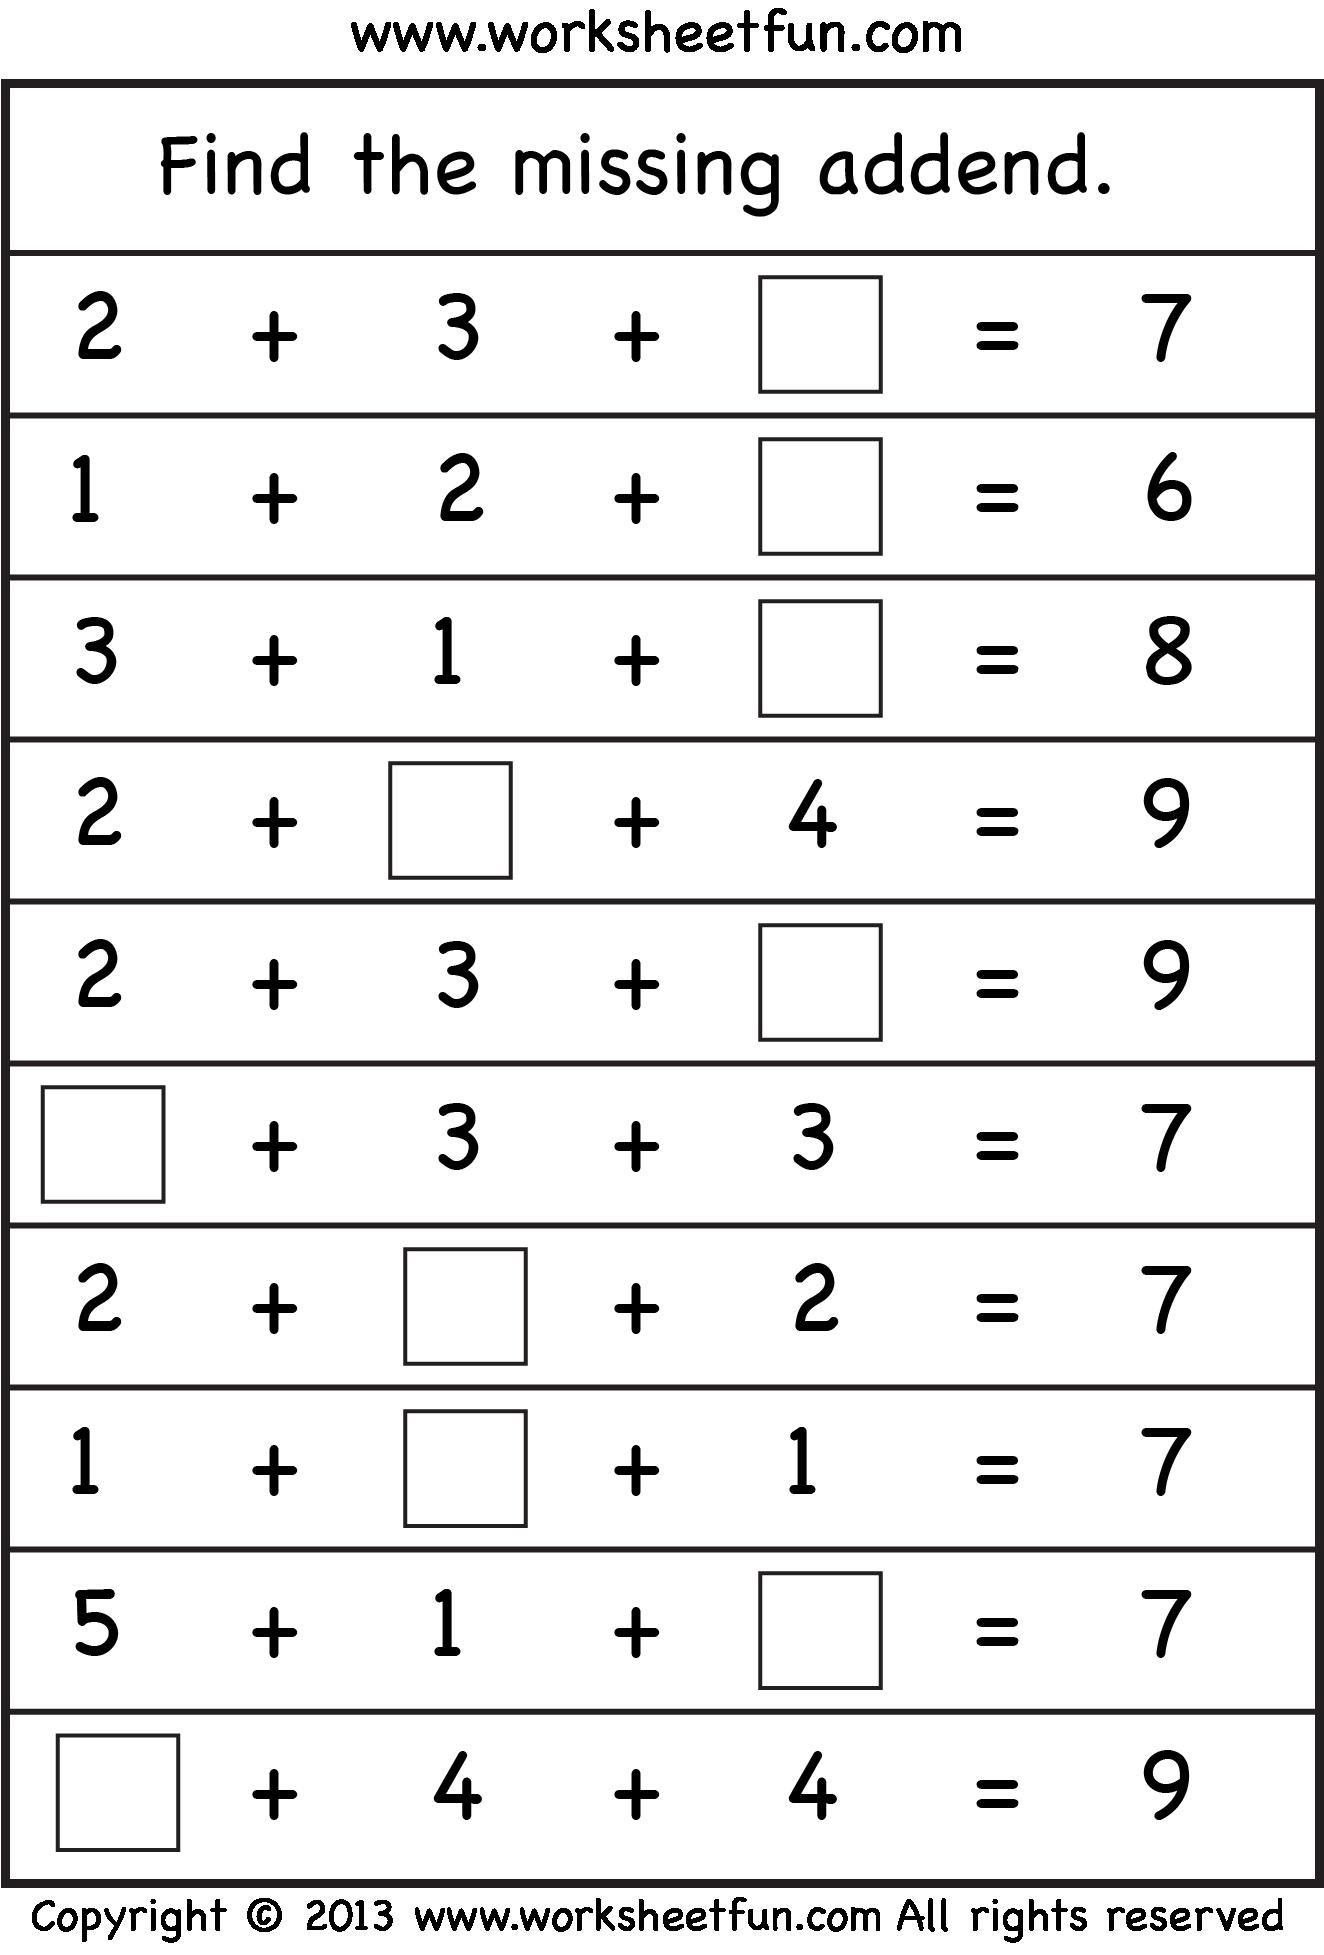 medium resolution of missing-addend-level2-W1-.png (1324×1955)   Mental maths worksheets